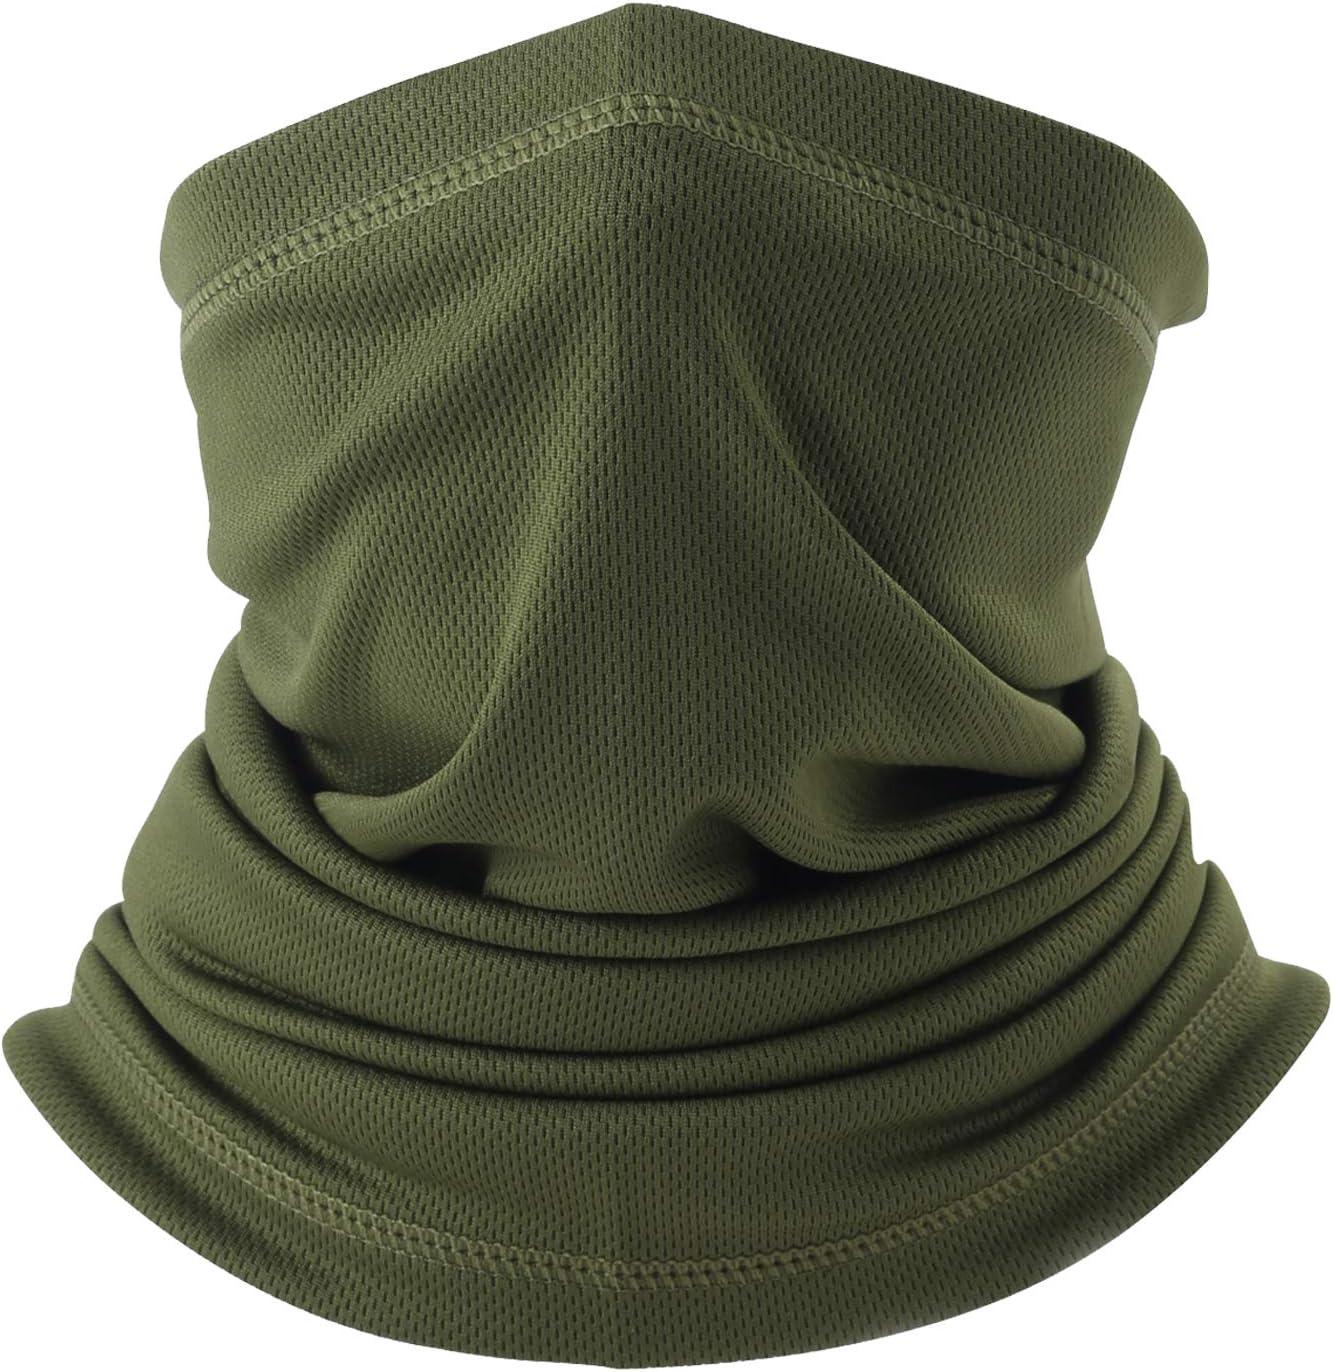 LONGLONG Summer Face Scarf Mask - Windproof, Breathable and Thin Cycling Hiking Fishing Cool Bandana